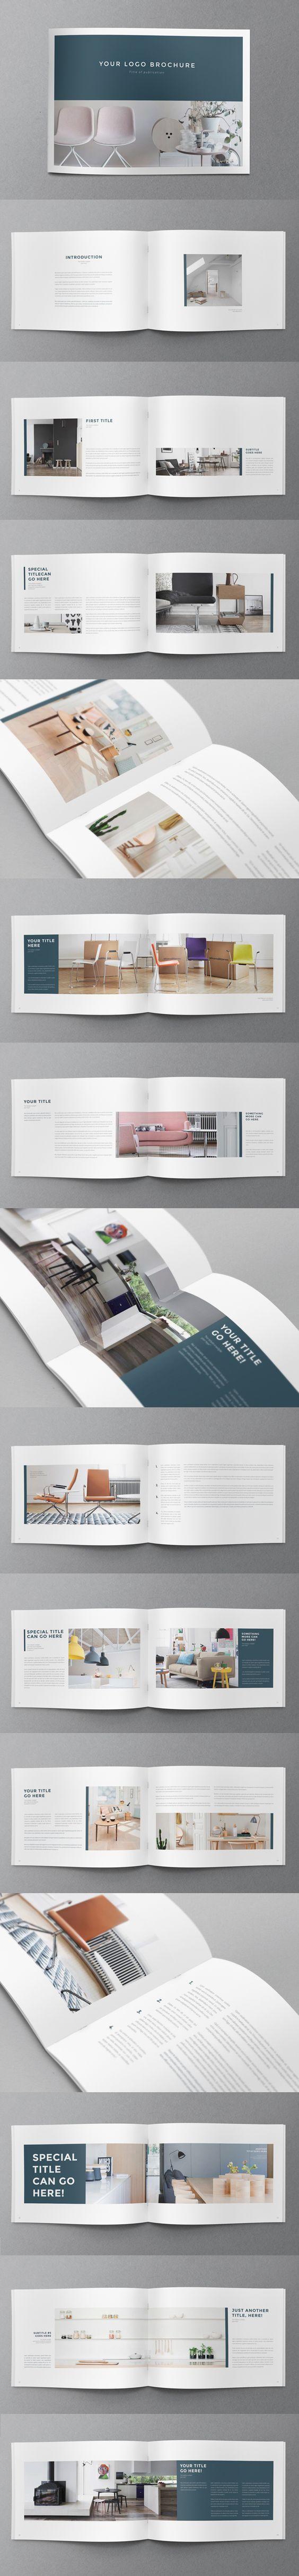 Interior Design Minimal Brochure. Download here: http://graphicriver.net/item/interior-design-minimal-brochure/11243000?ref=abradesign #brochure #design: